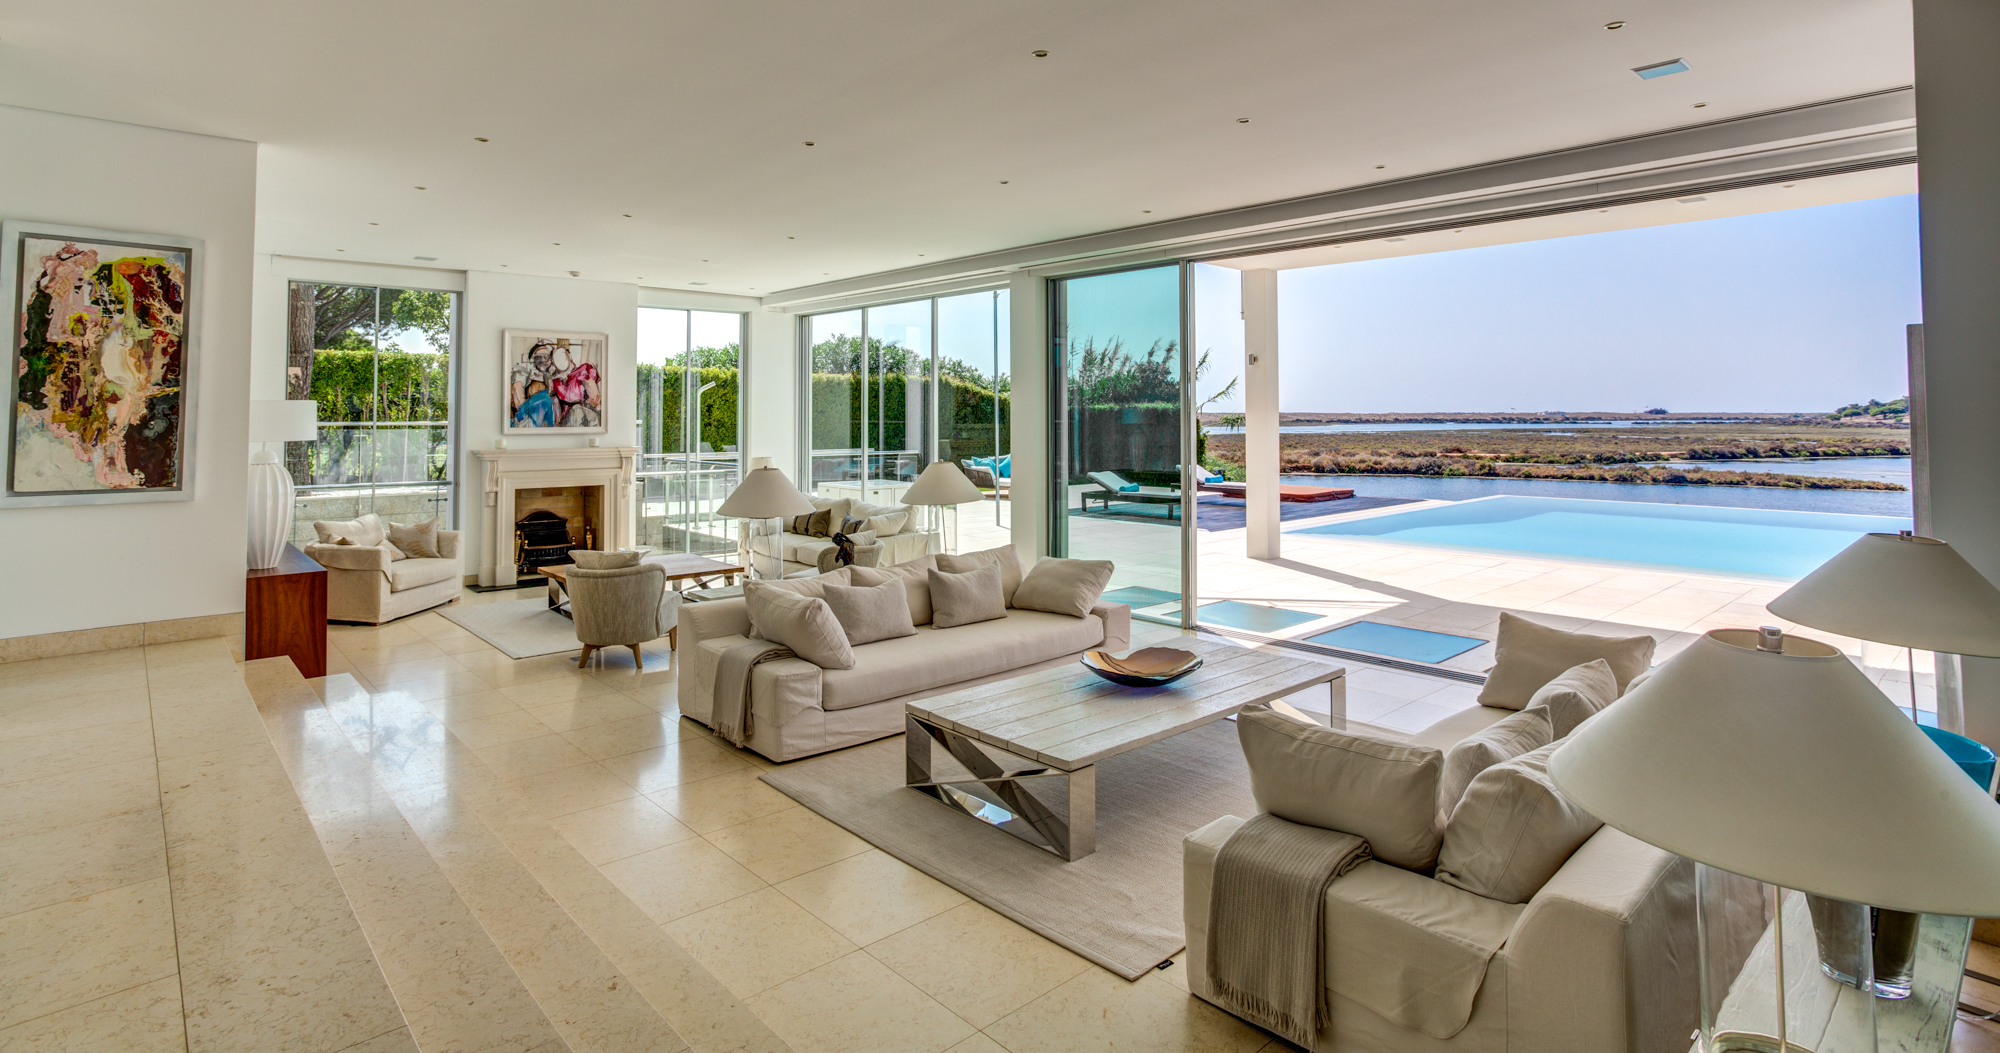 Villa Moon Sone, 5 bedroom prestige villa in Quinta do Lago, Algarve,lounge 3.jpg